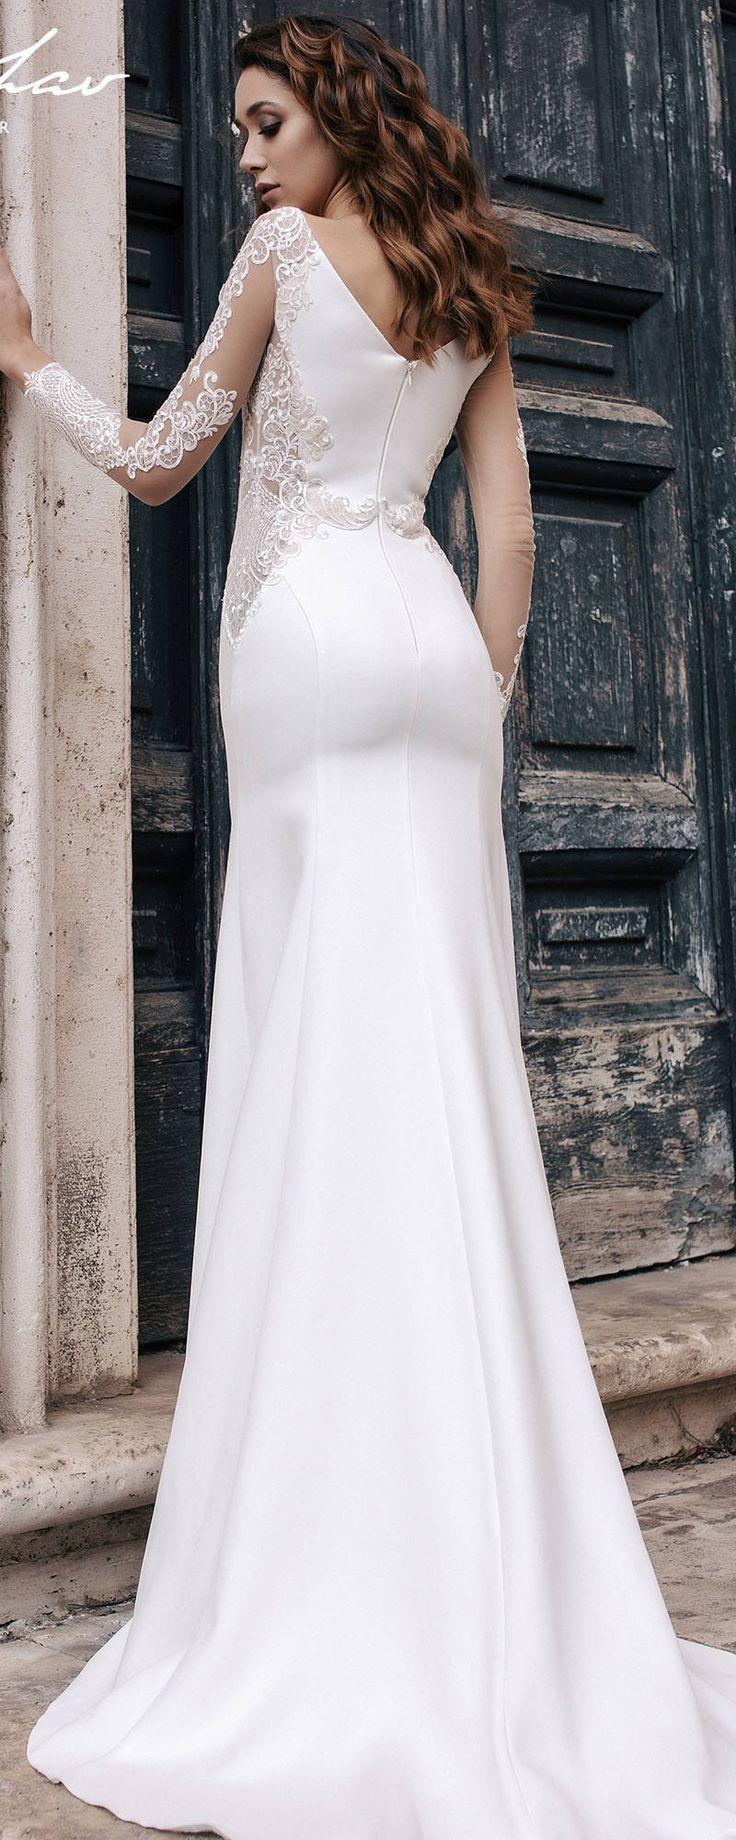 Wedding dress Cher. Bridal dress. Lace wedding dress